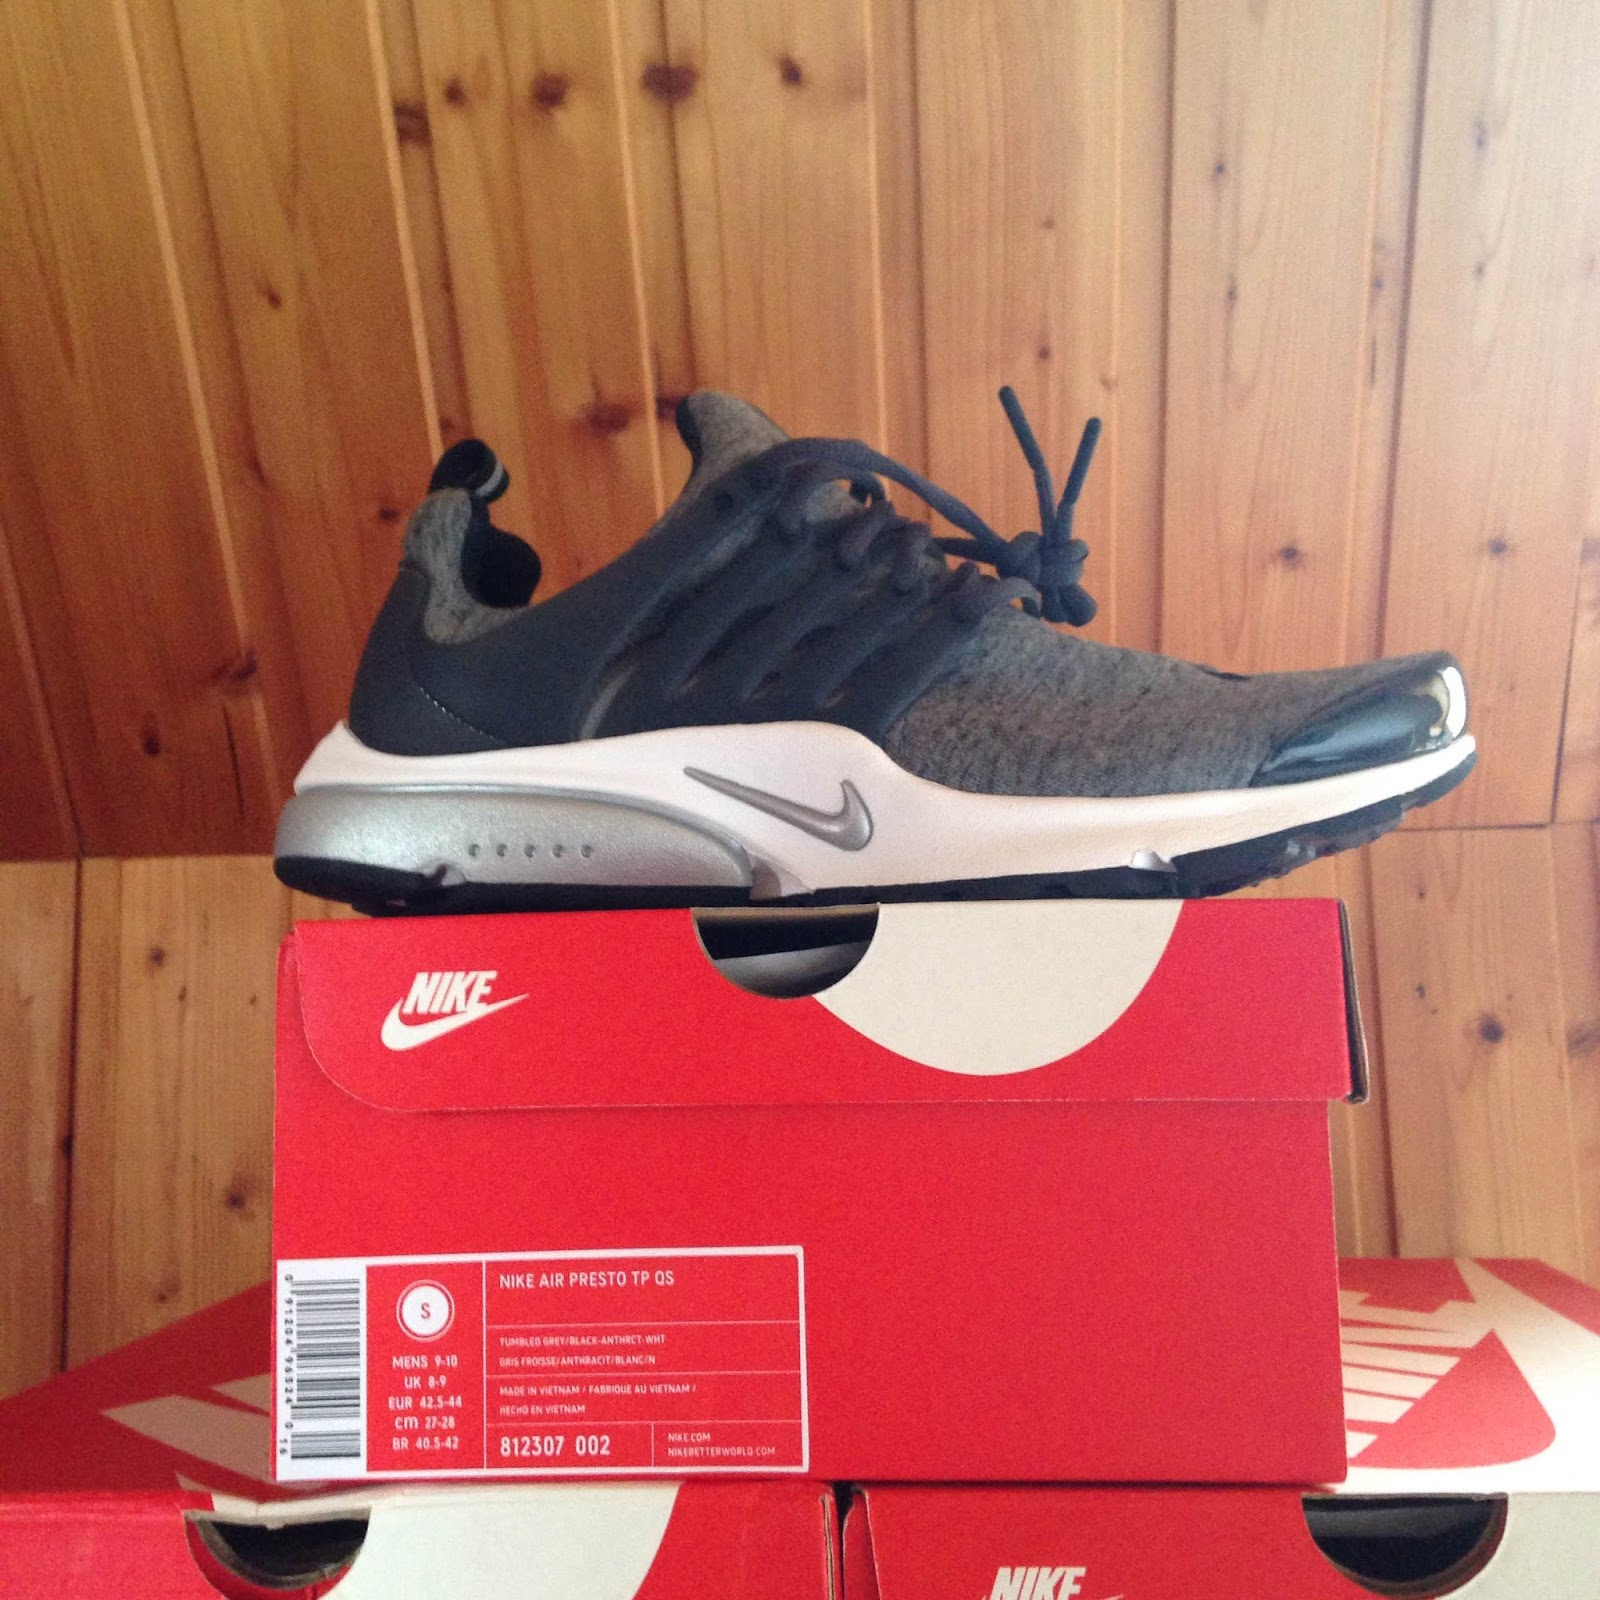 buy popular 0a97d 667e6 recordselling  Nike Air Presto TP QS Fleece Tech Pack Grey (812307-002) OG  new w  box deadstock